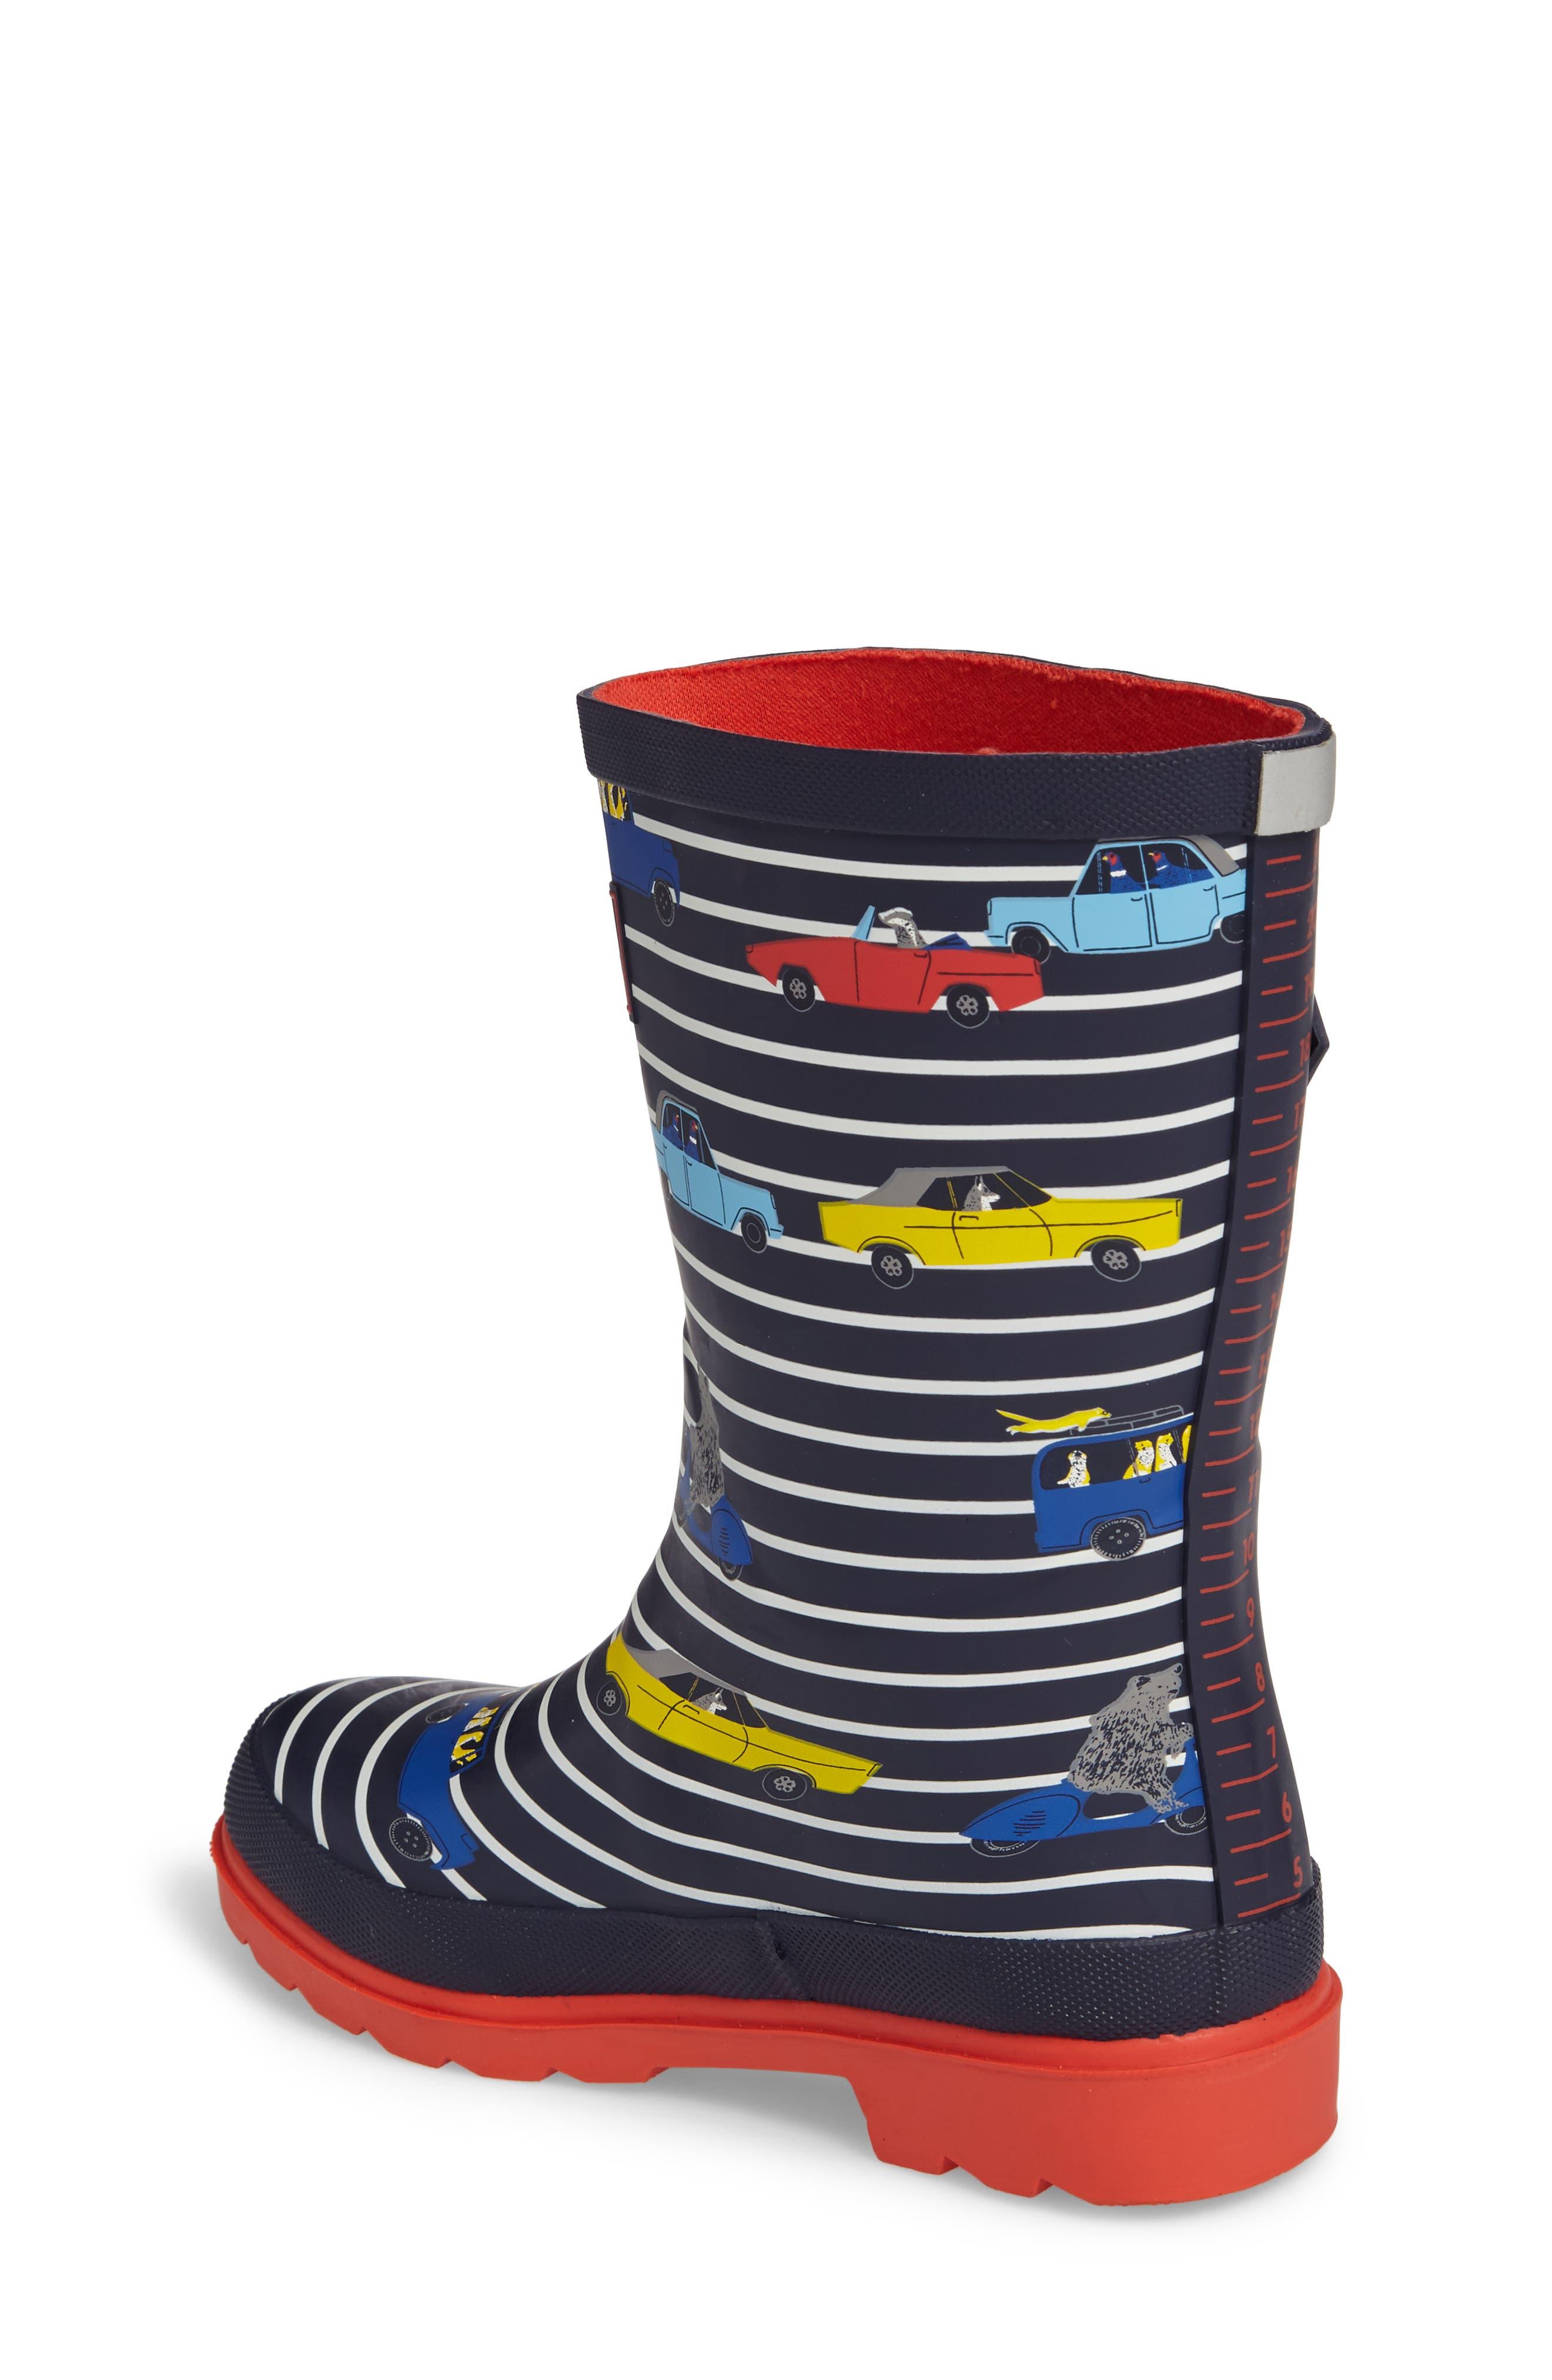 Printed Waterproof Rain Boot,                             Alternate thumbnail 2, color,                             Navy Stripe Cars